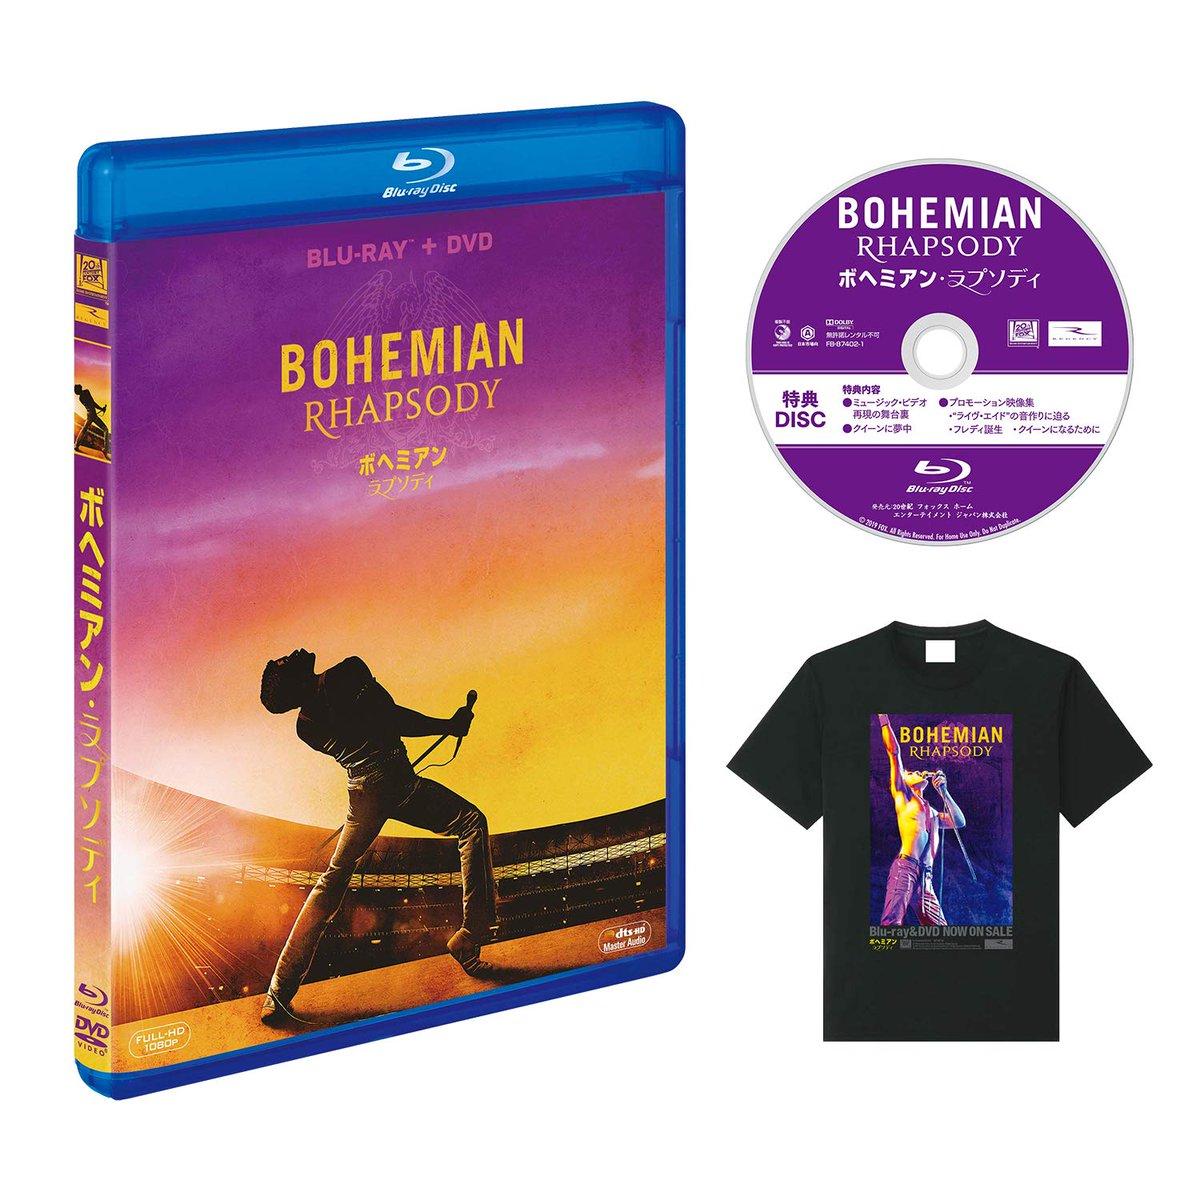 test ツイッターメディア - 今Amazonで【https://t.co/n8X5yPDAfl限定】ボヘミアン・ラプソディ 2枚組ブルーレイ&DVD (特典映像ディスク&オリジナルTシャツ付き)[Blu-ray]がベストセラー!https://t.co/a1aCfLhIef https://t.co/yZQuu80zF2